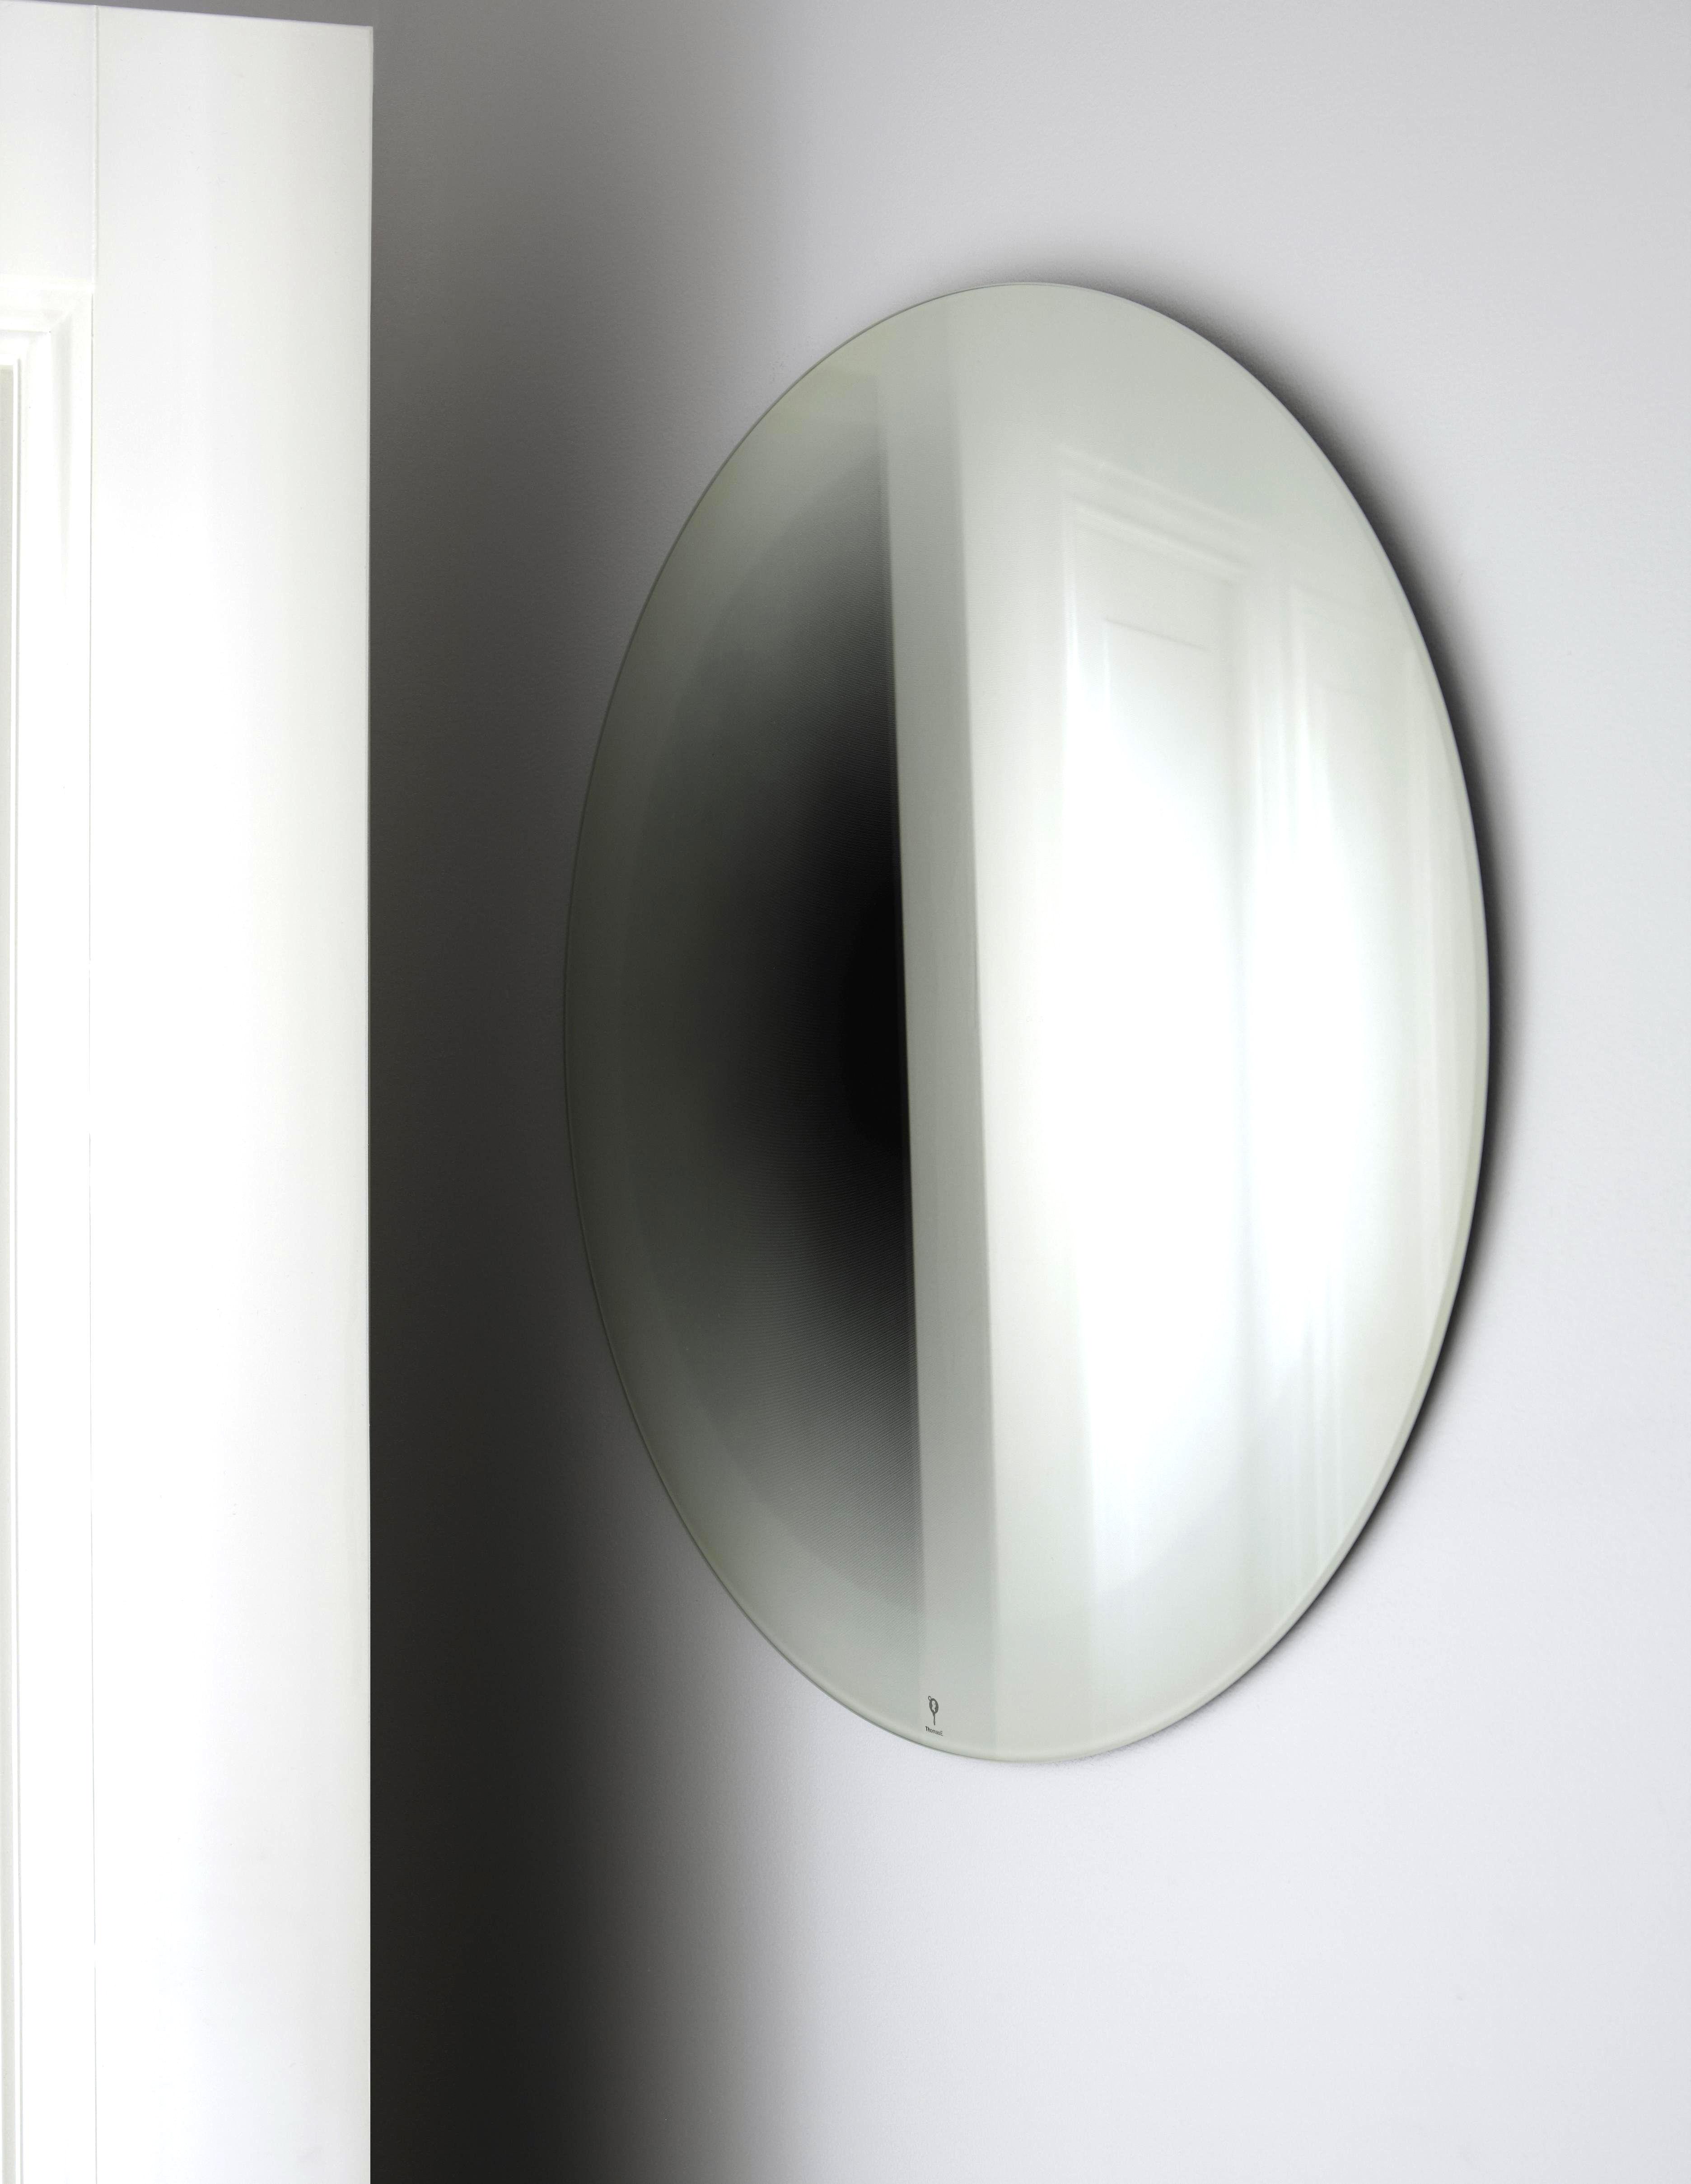 Mobilier - Miroirs - Miroir mural Fading Small / Ø 55 cm - ENOstudio - Blanc - Argent, Verre